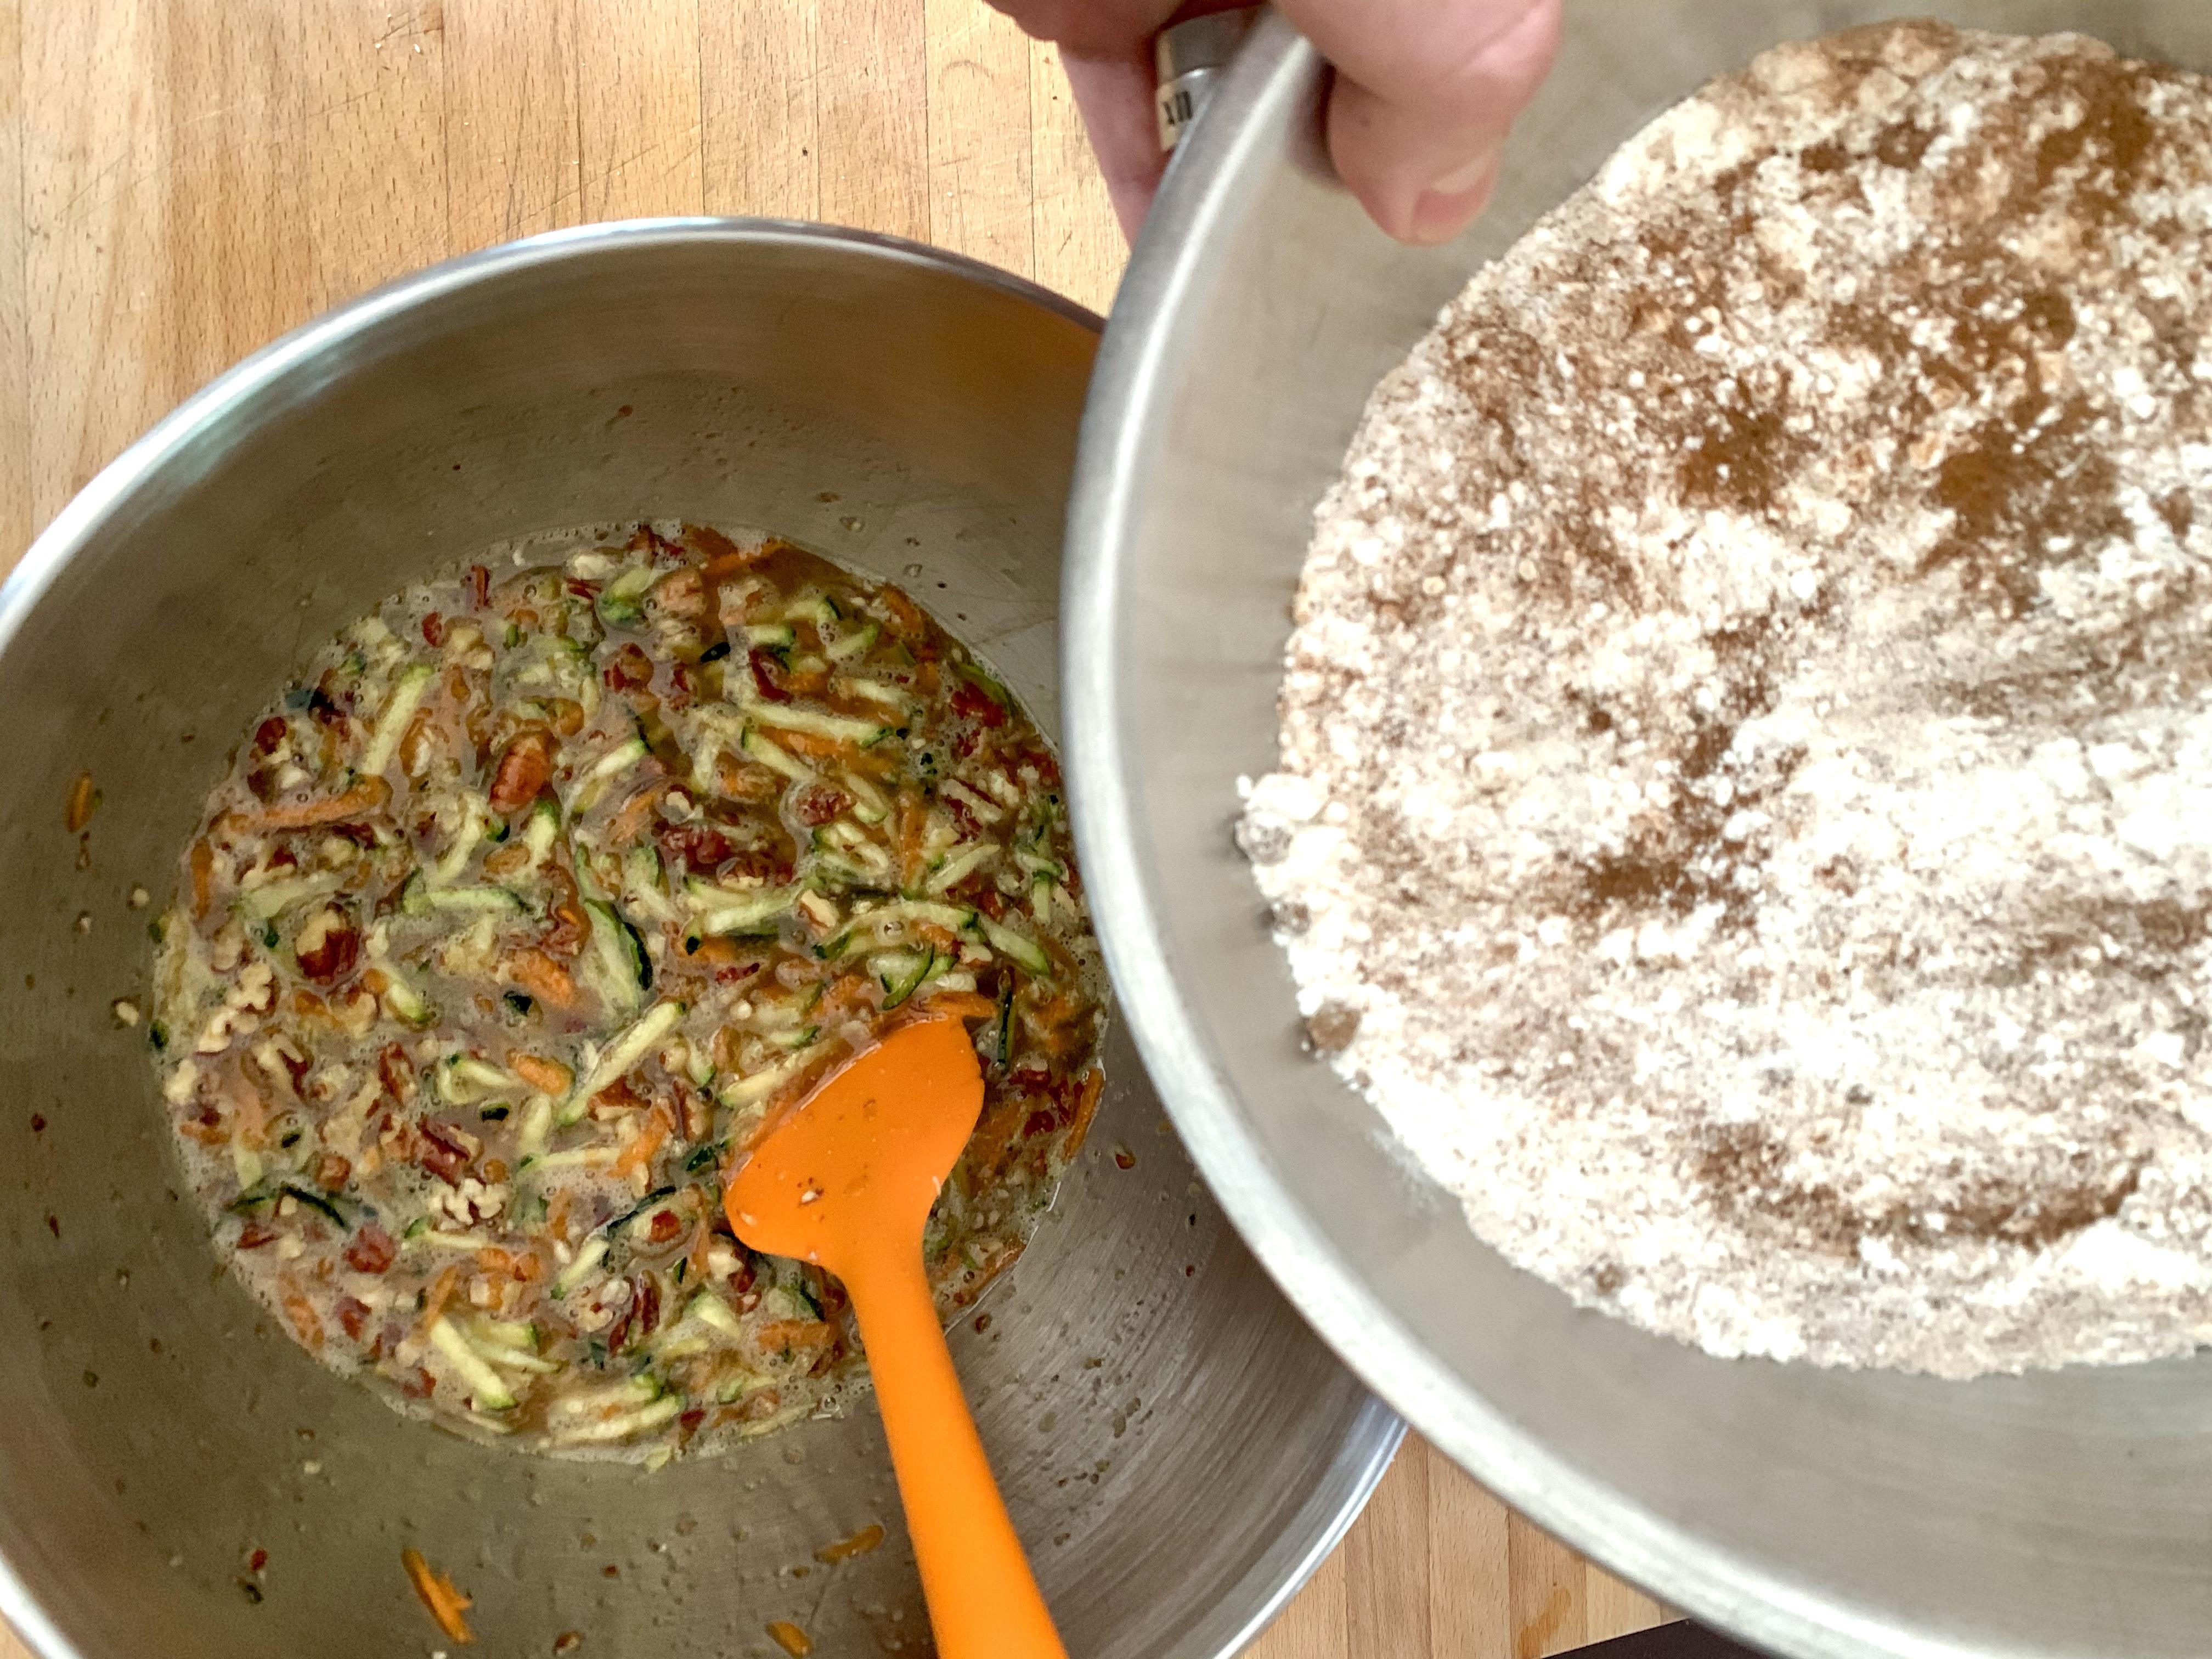 Slowly Stir In the Dry Ingredients